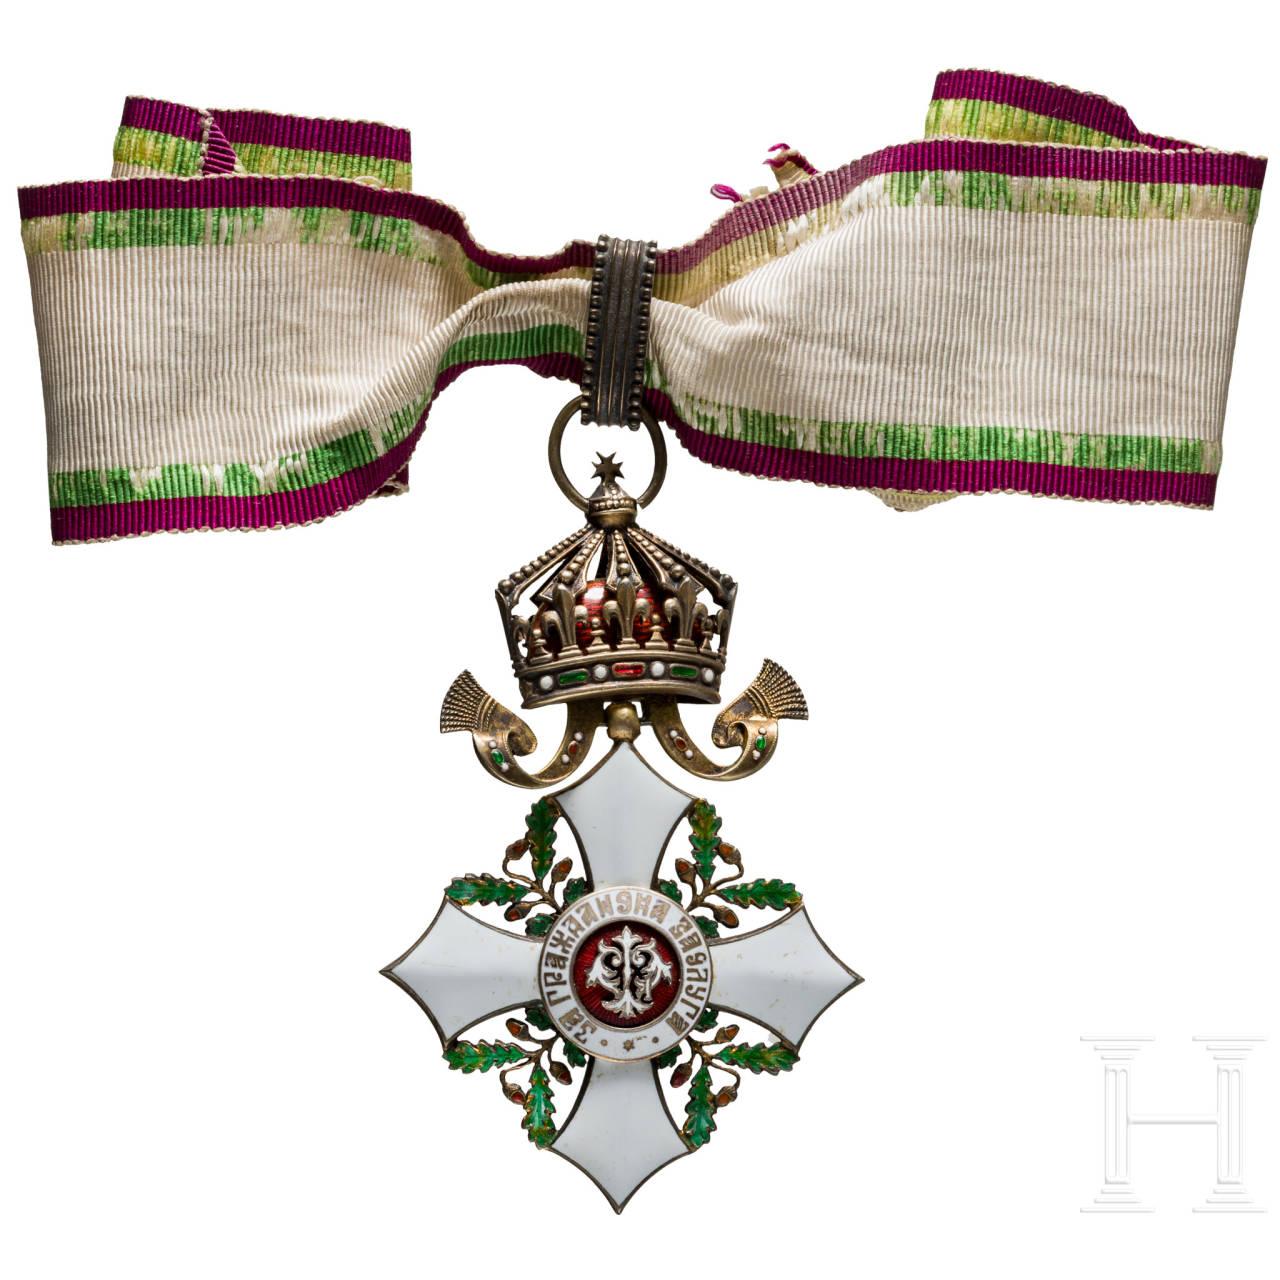 Order of Civil Service, Commander's Cross